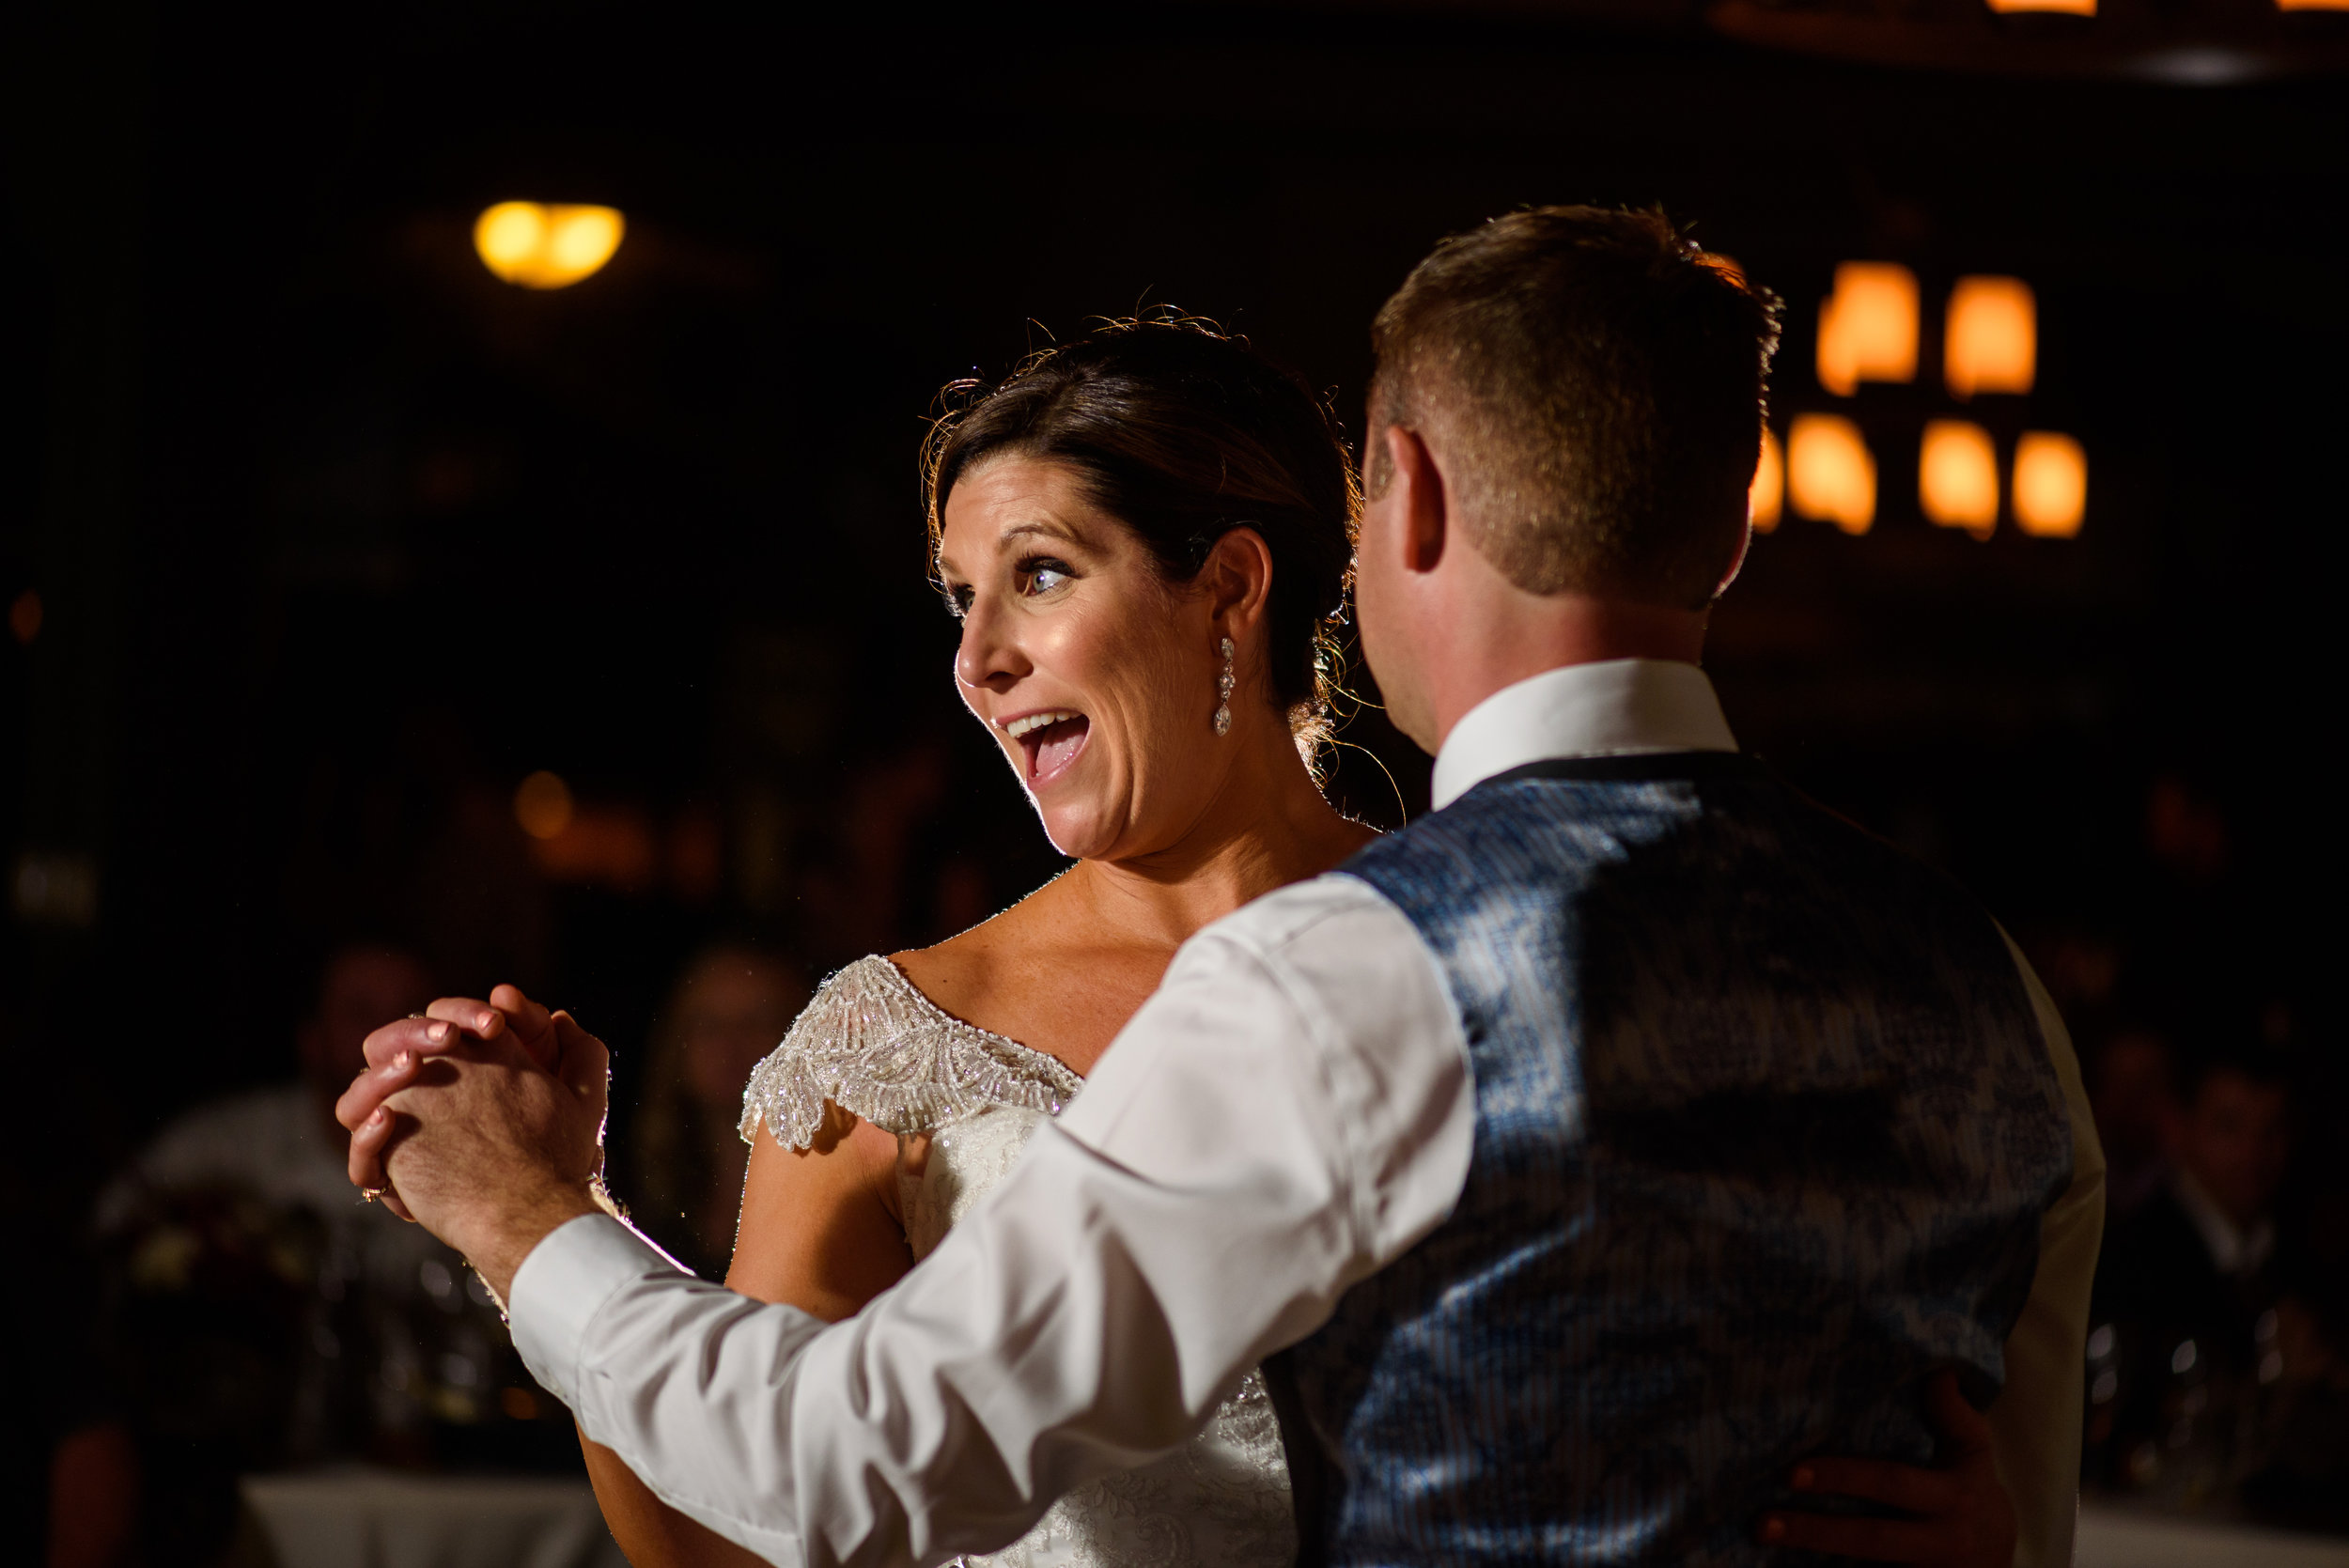 annie-brian-030-antiquite-midtown-sacramento-wedding-photographer-katherine-nicole-photography.JPG